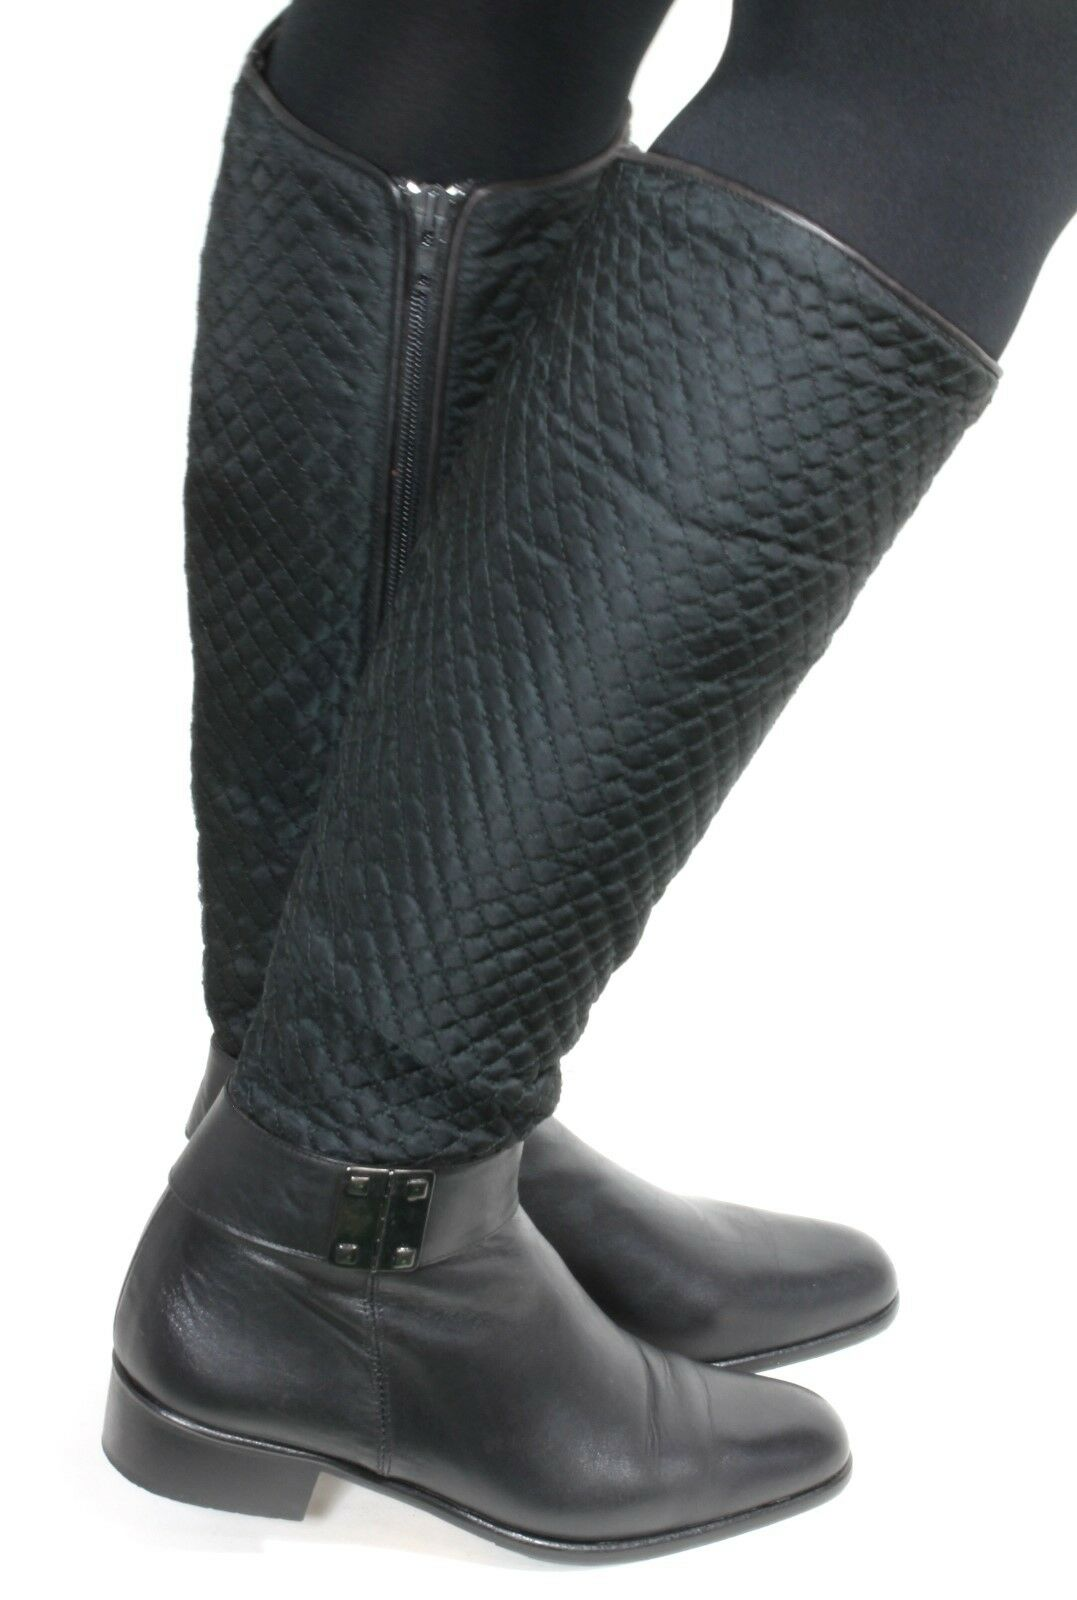 Leder Vintage Reiterstiefel Military Damenstiefel Hipster Zipper Agnese Rom 37